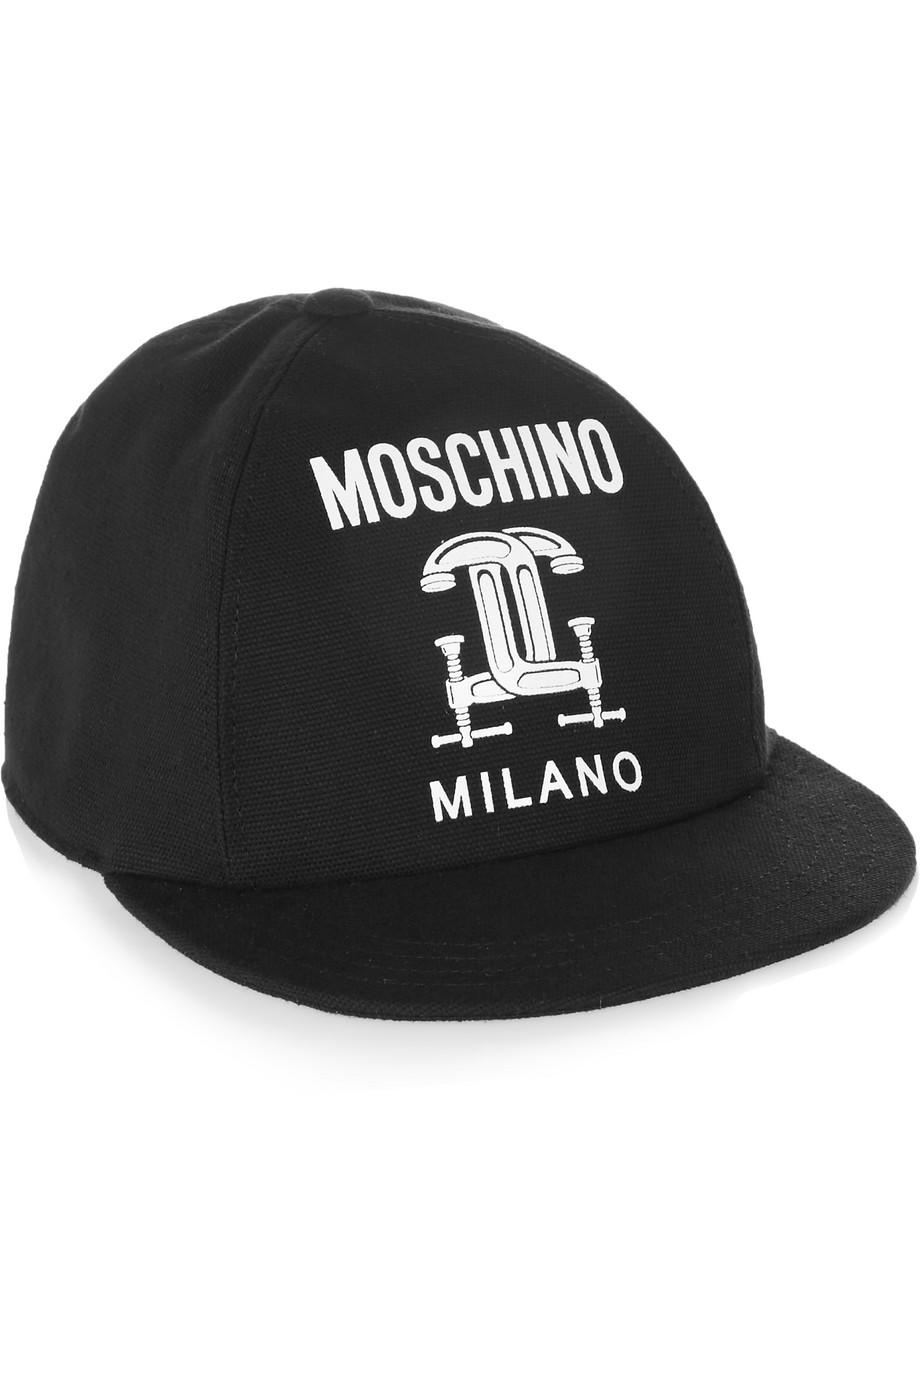 Moschino Printed Cotton-Piqué Baseball Cap, Black, Women's, Size: L